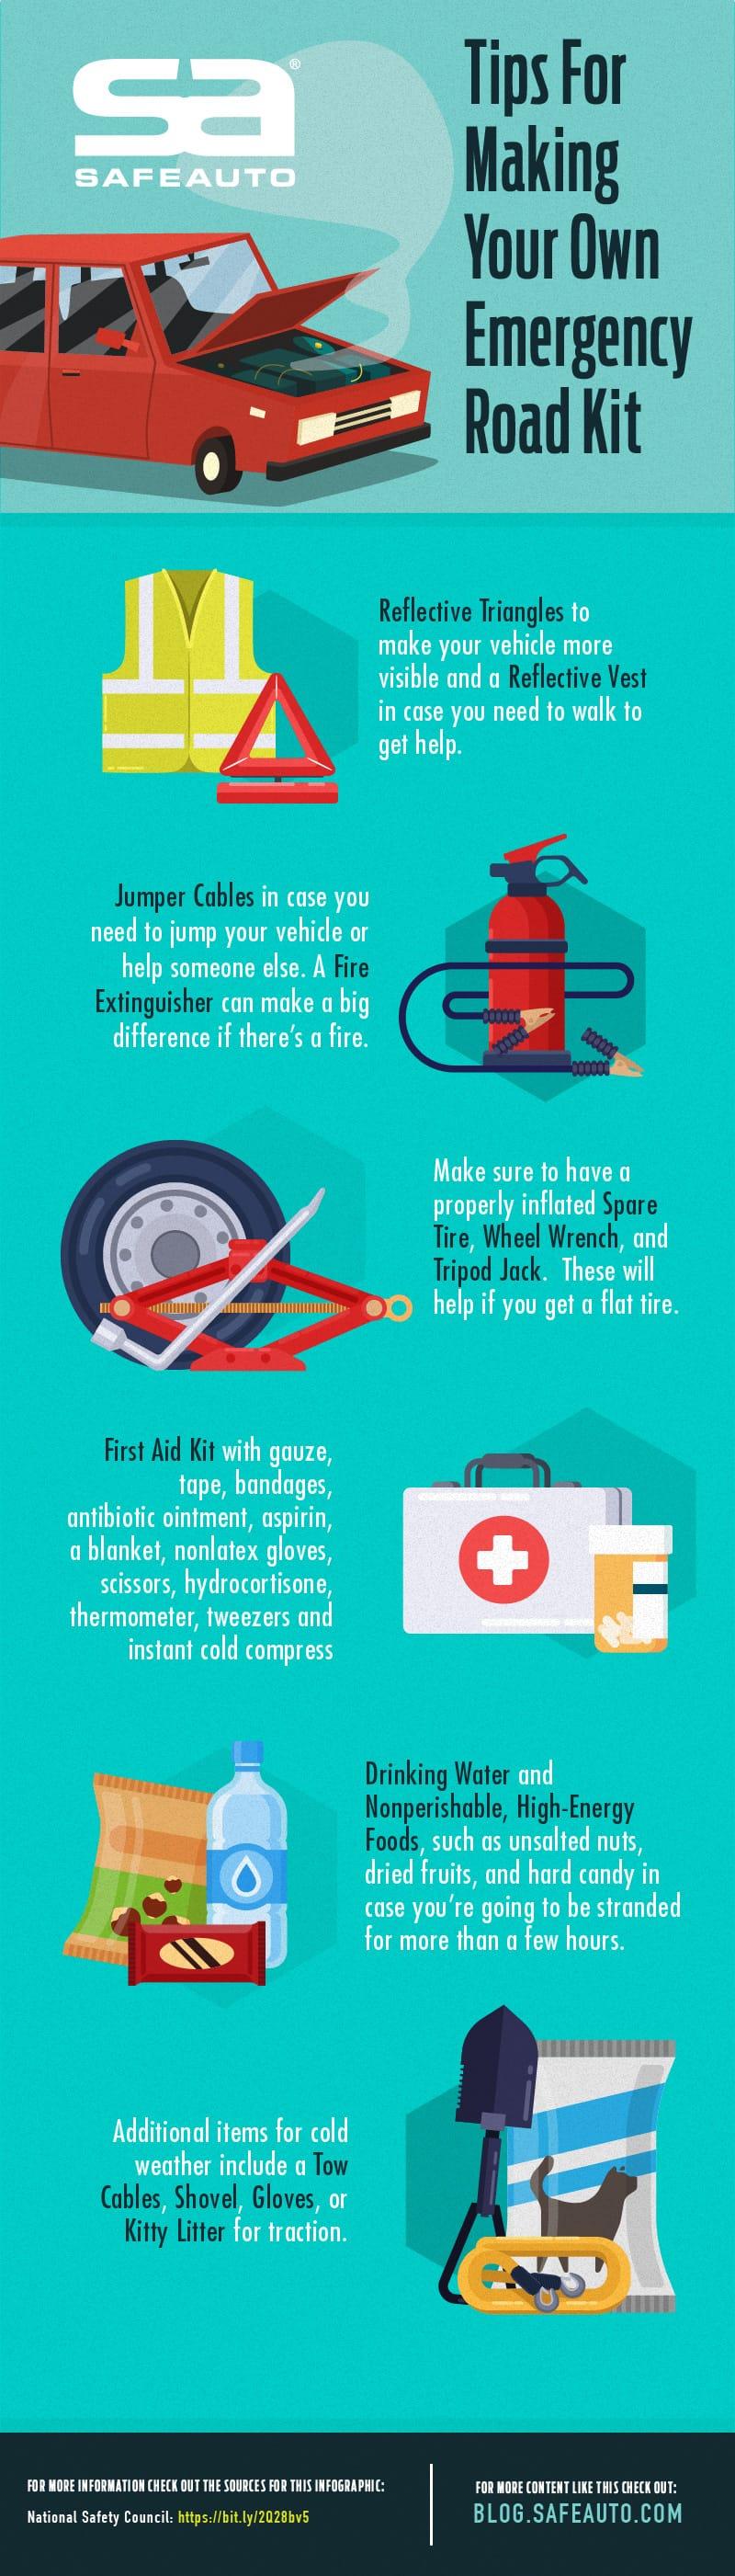 Tips for Making Your Own Emergency Roadkit